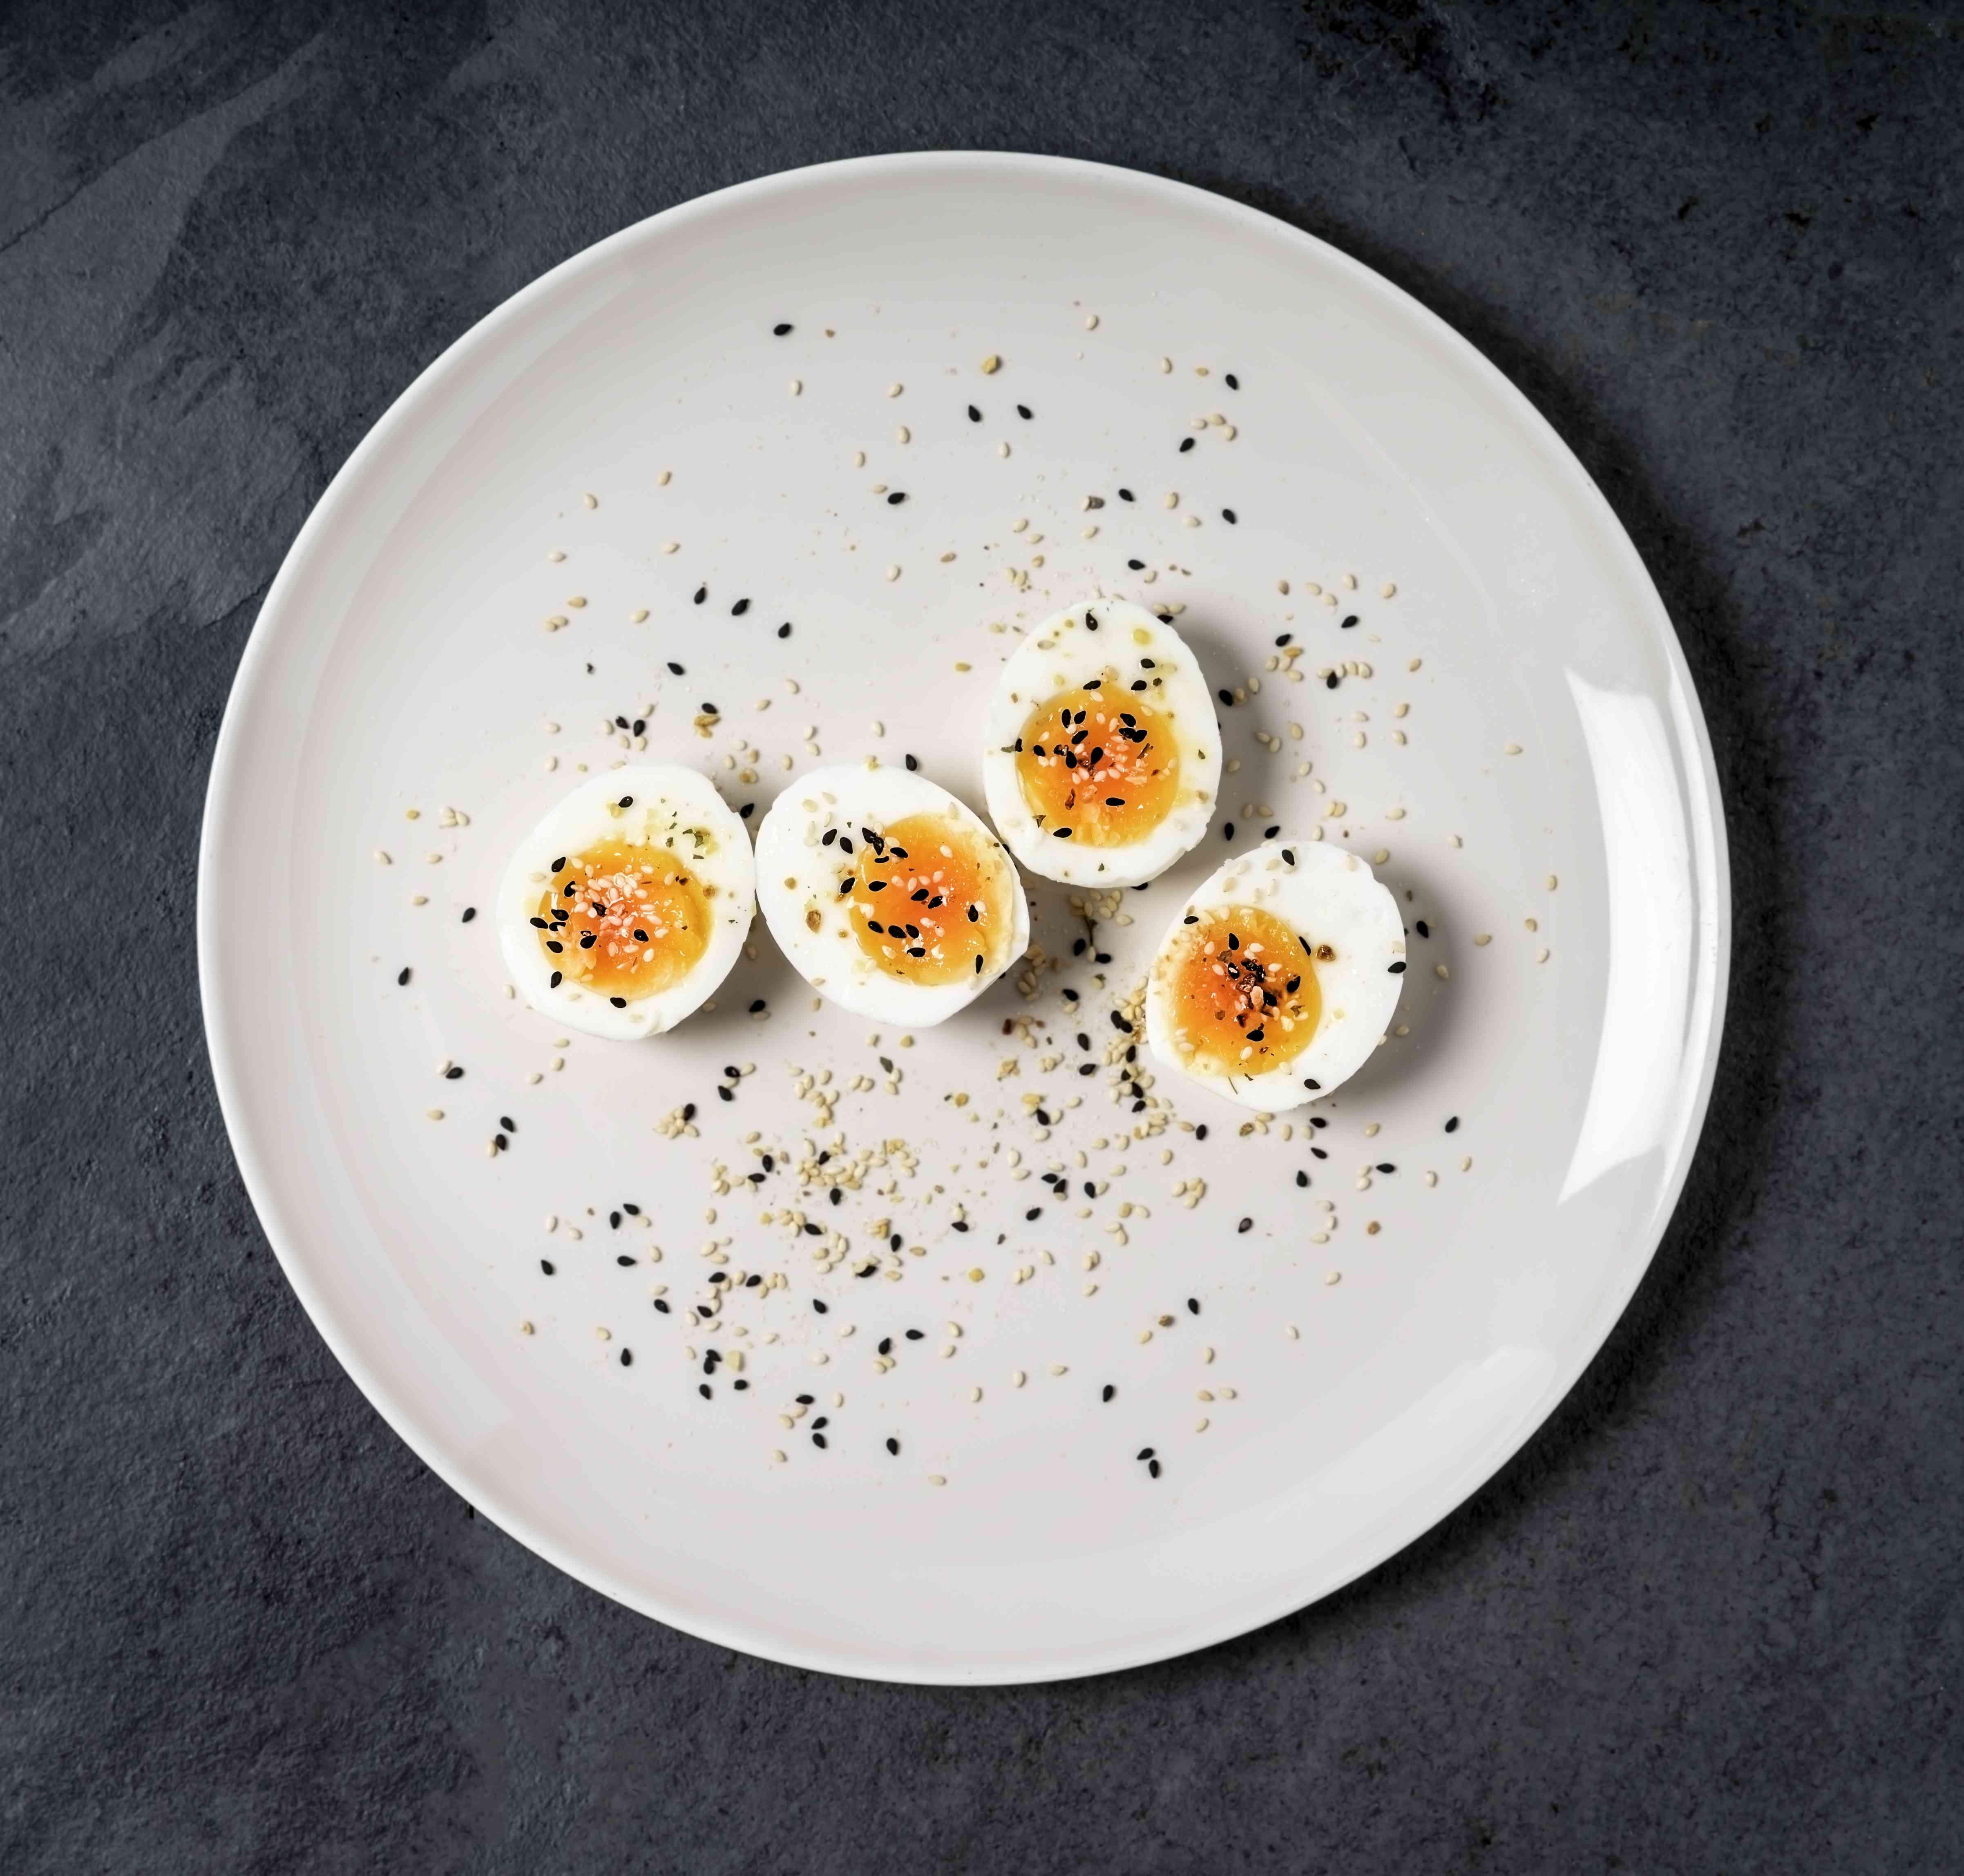 hard boiled eggs on plate